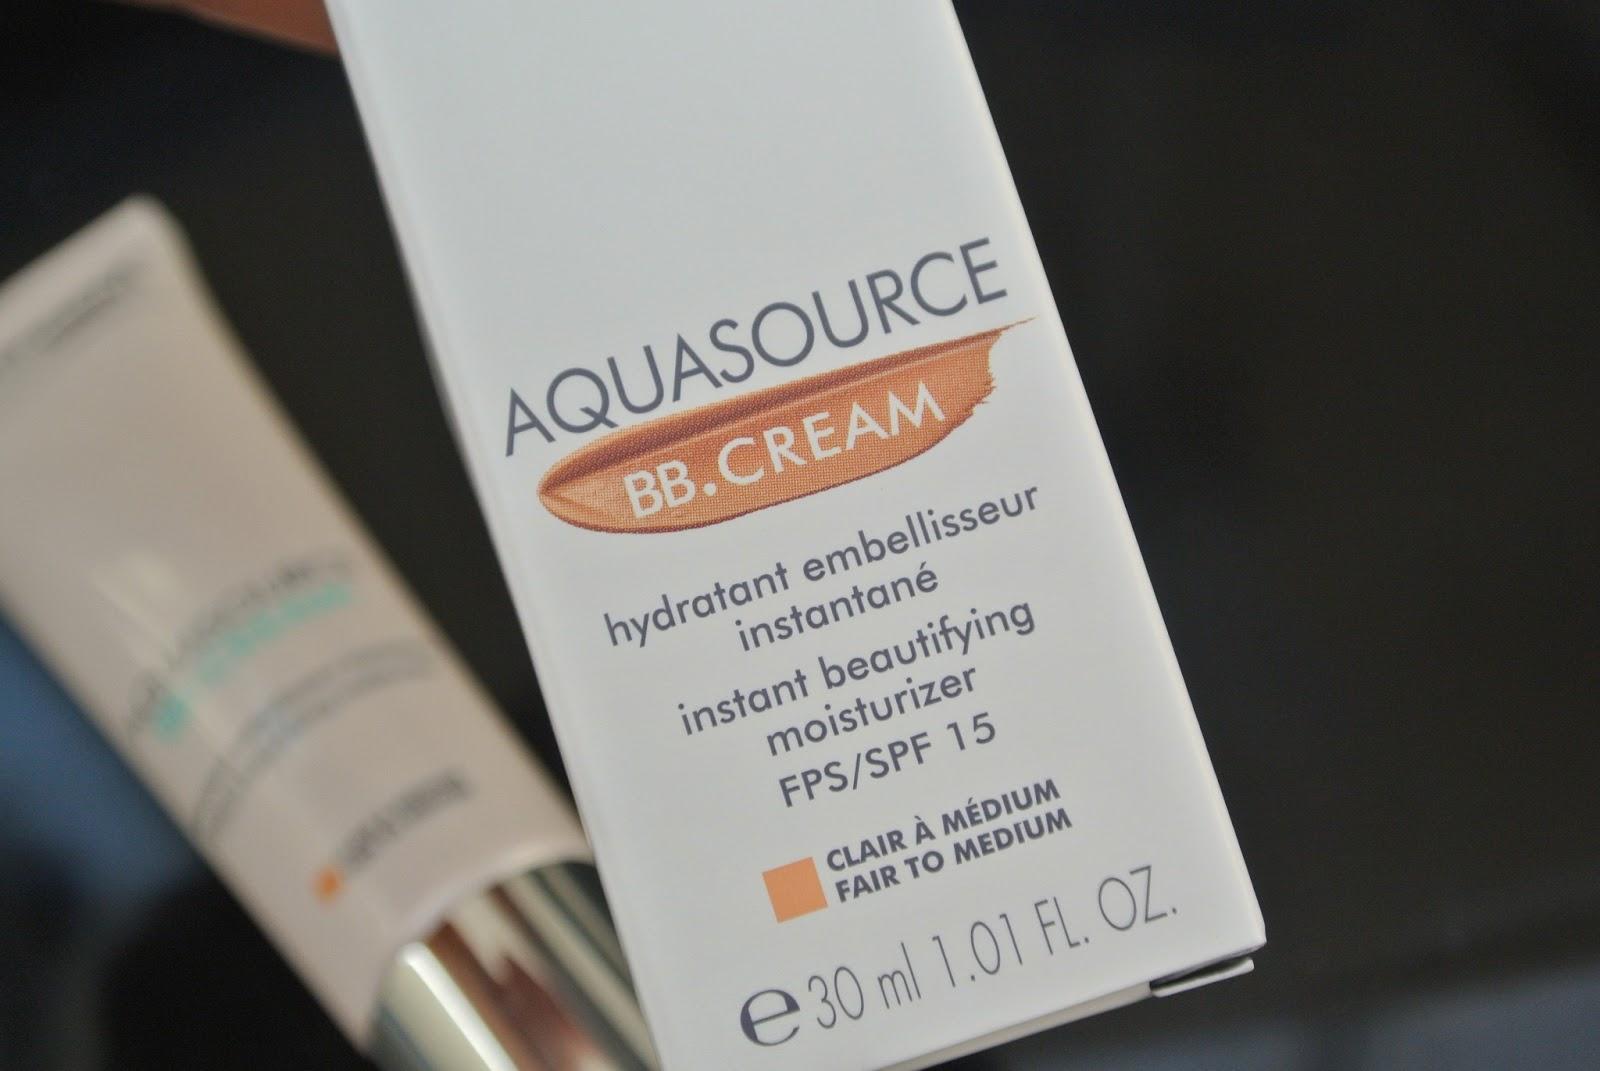 Aquasource BB Cream by Biotherm #9